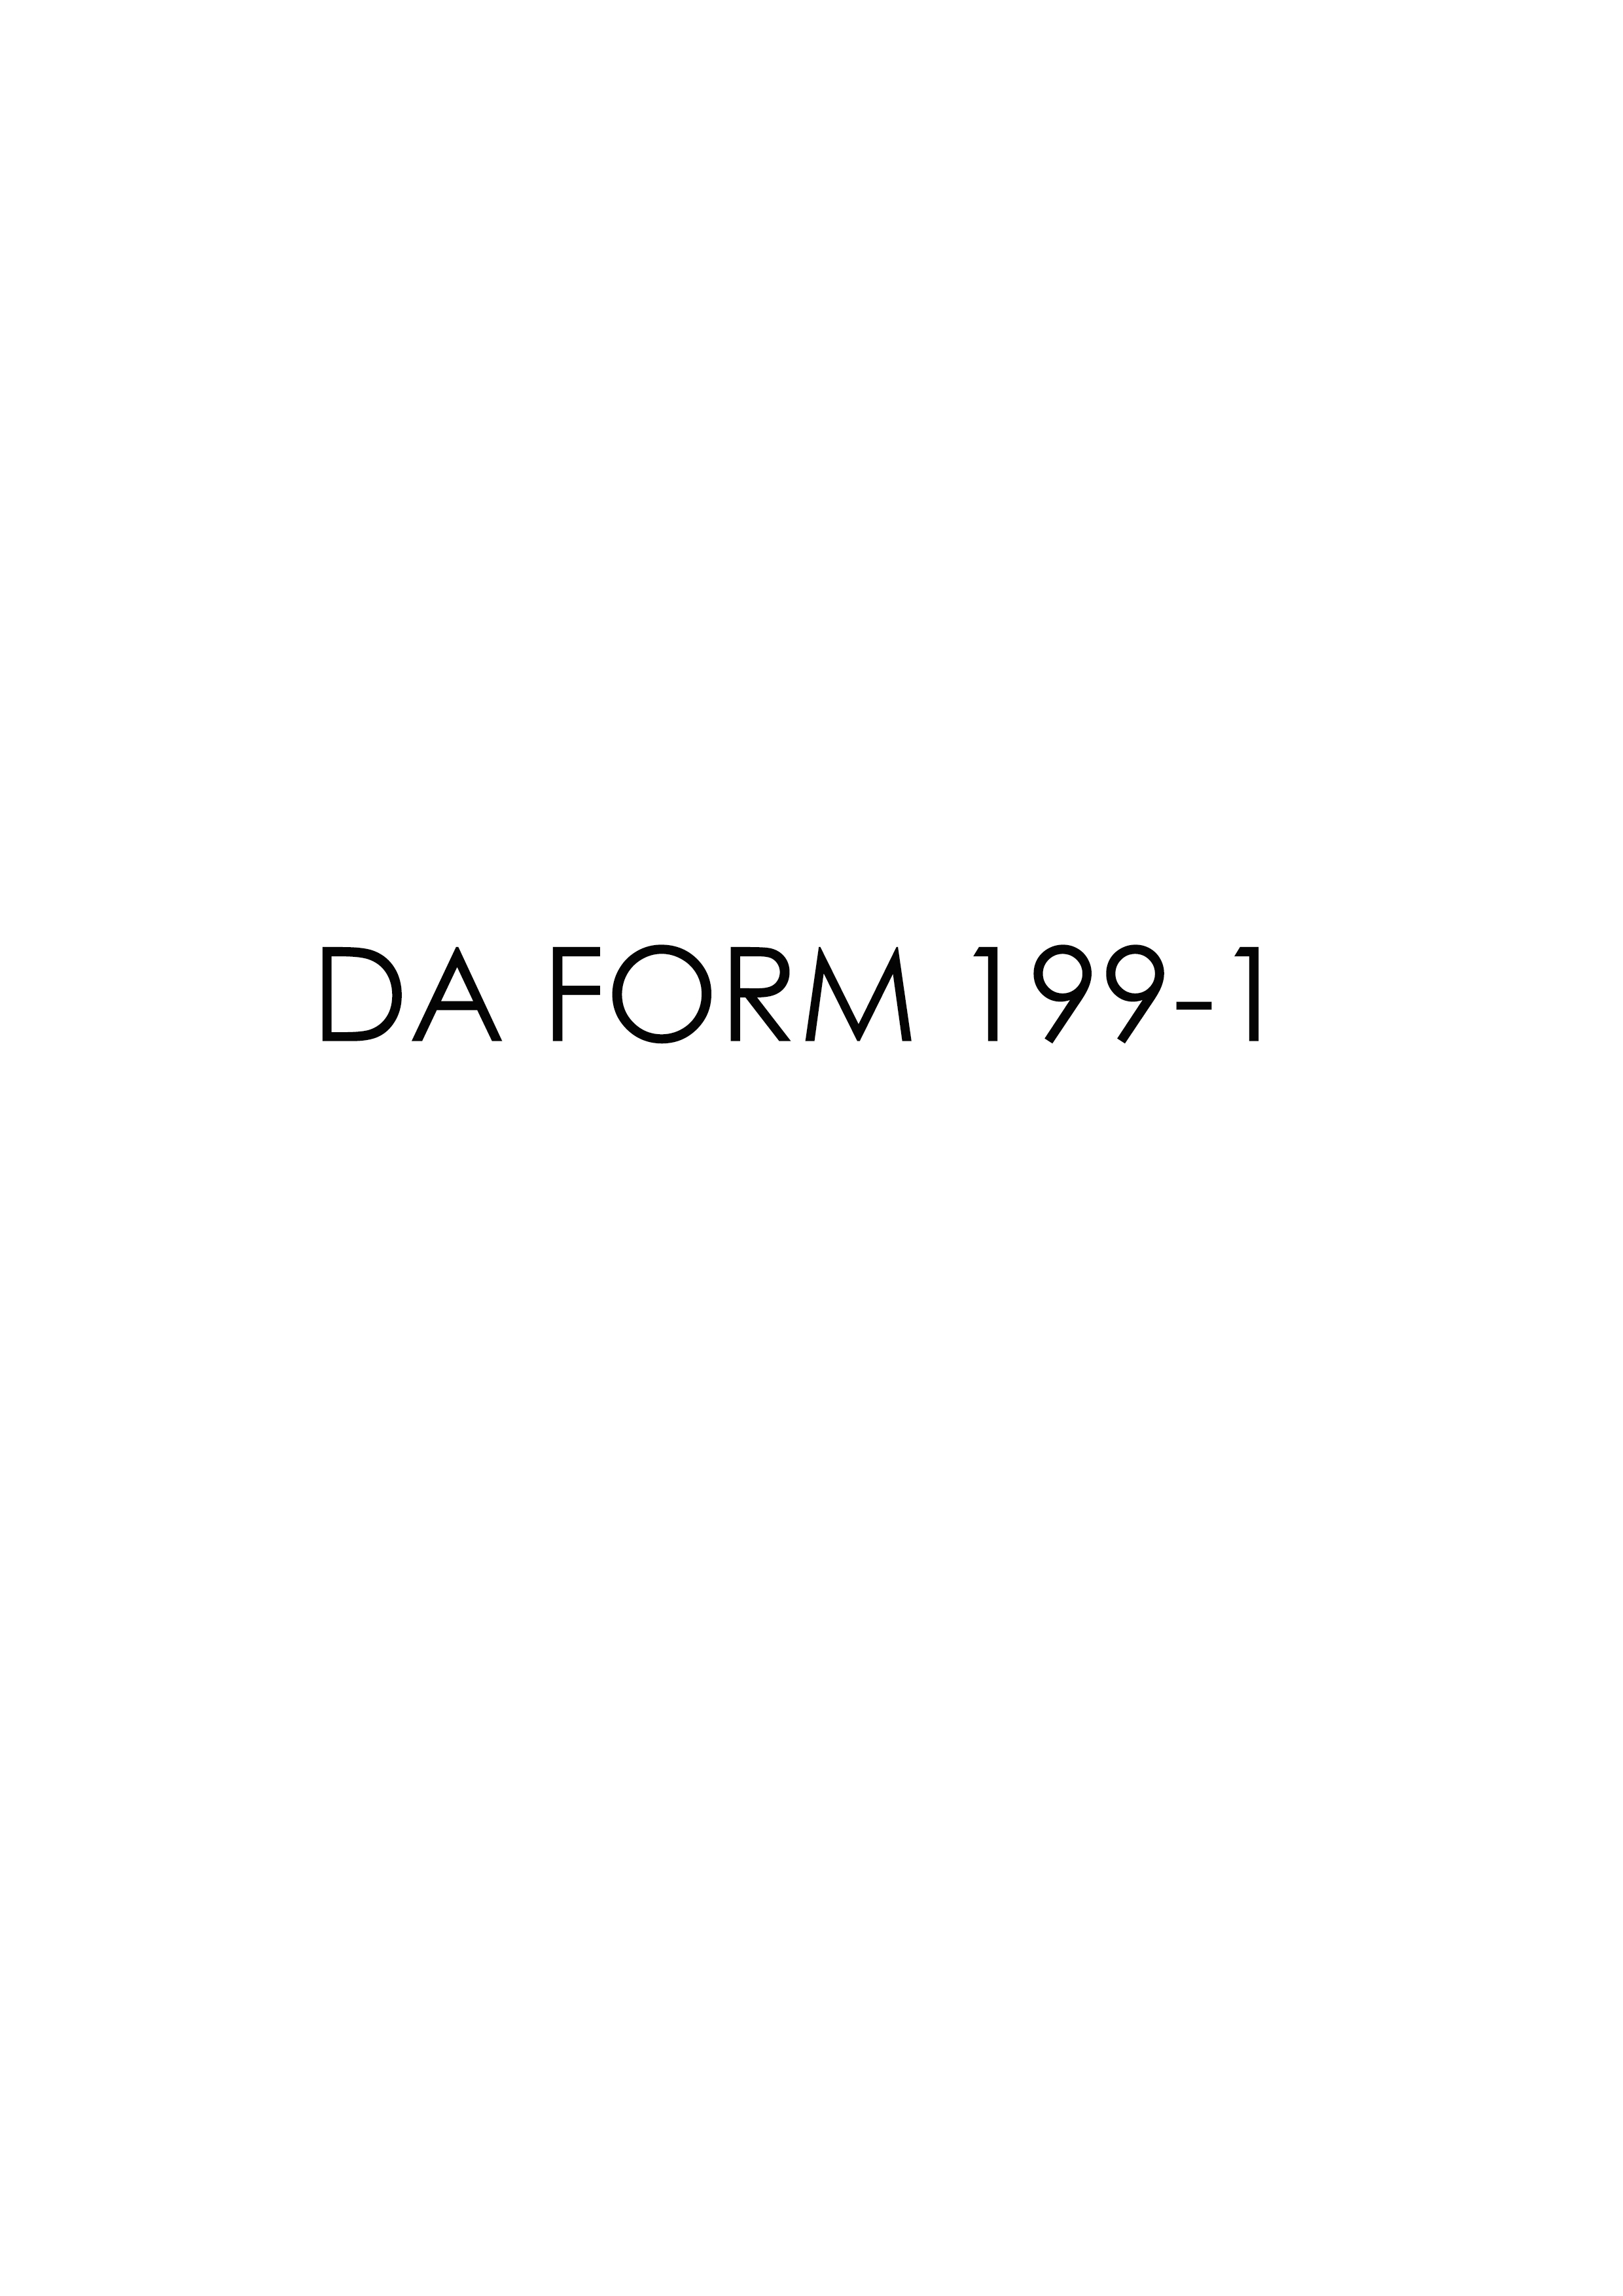 Download da Form 199-1 Free